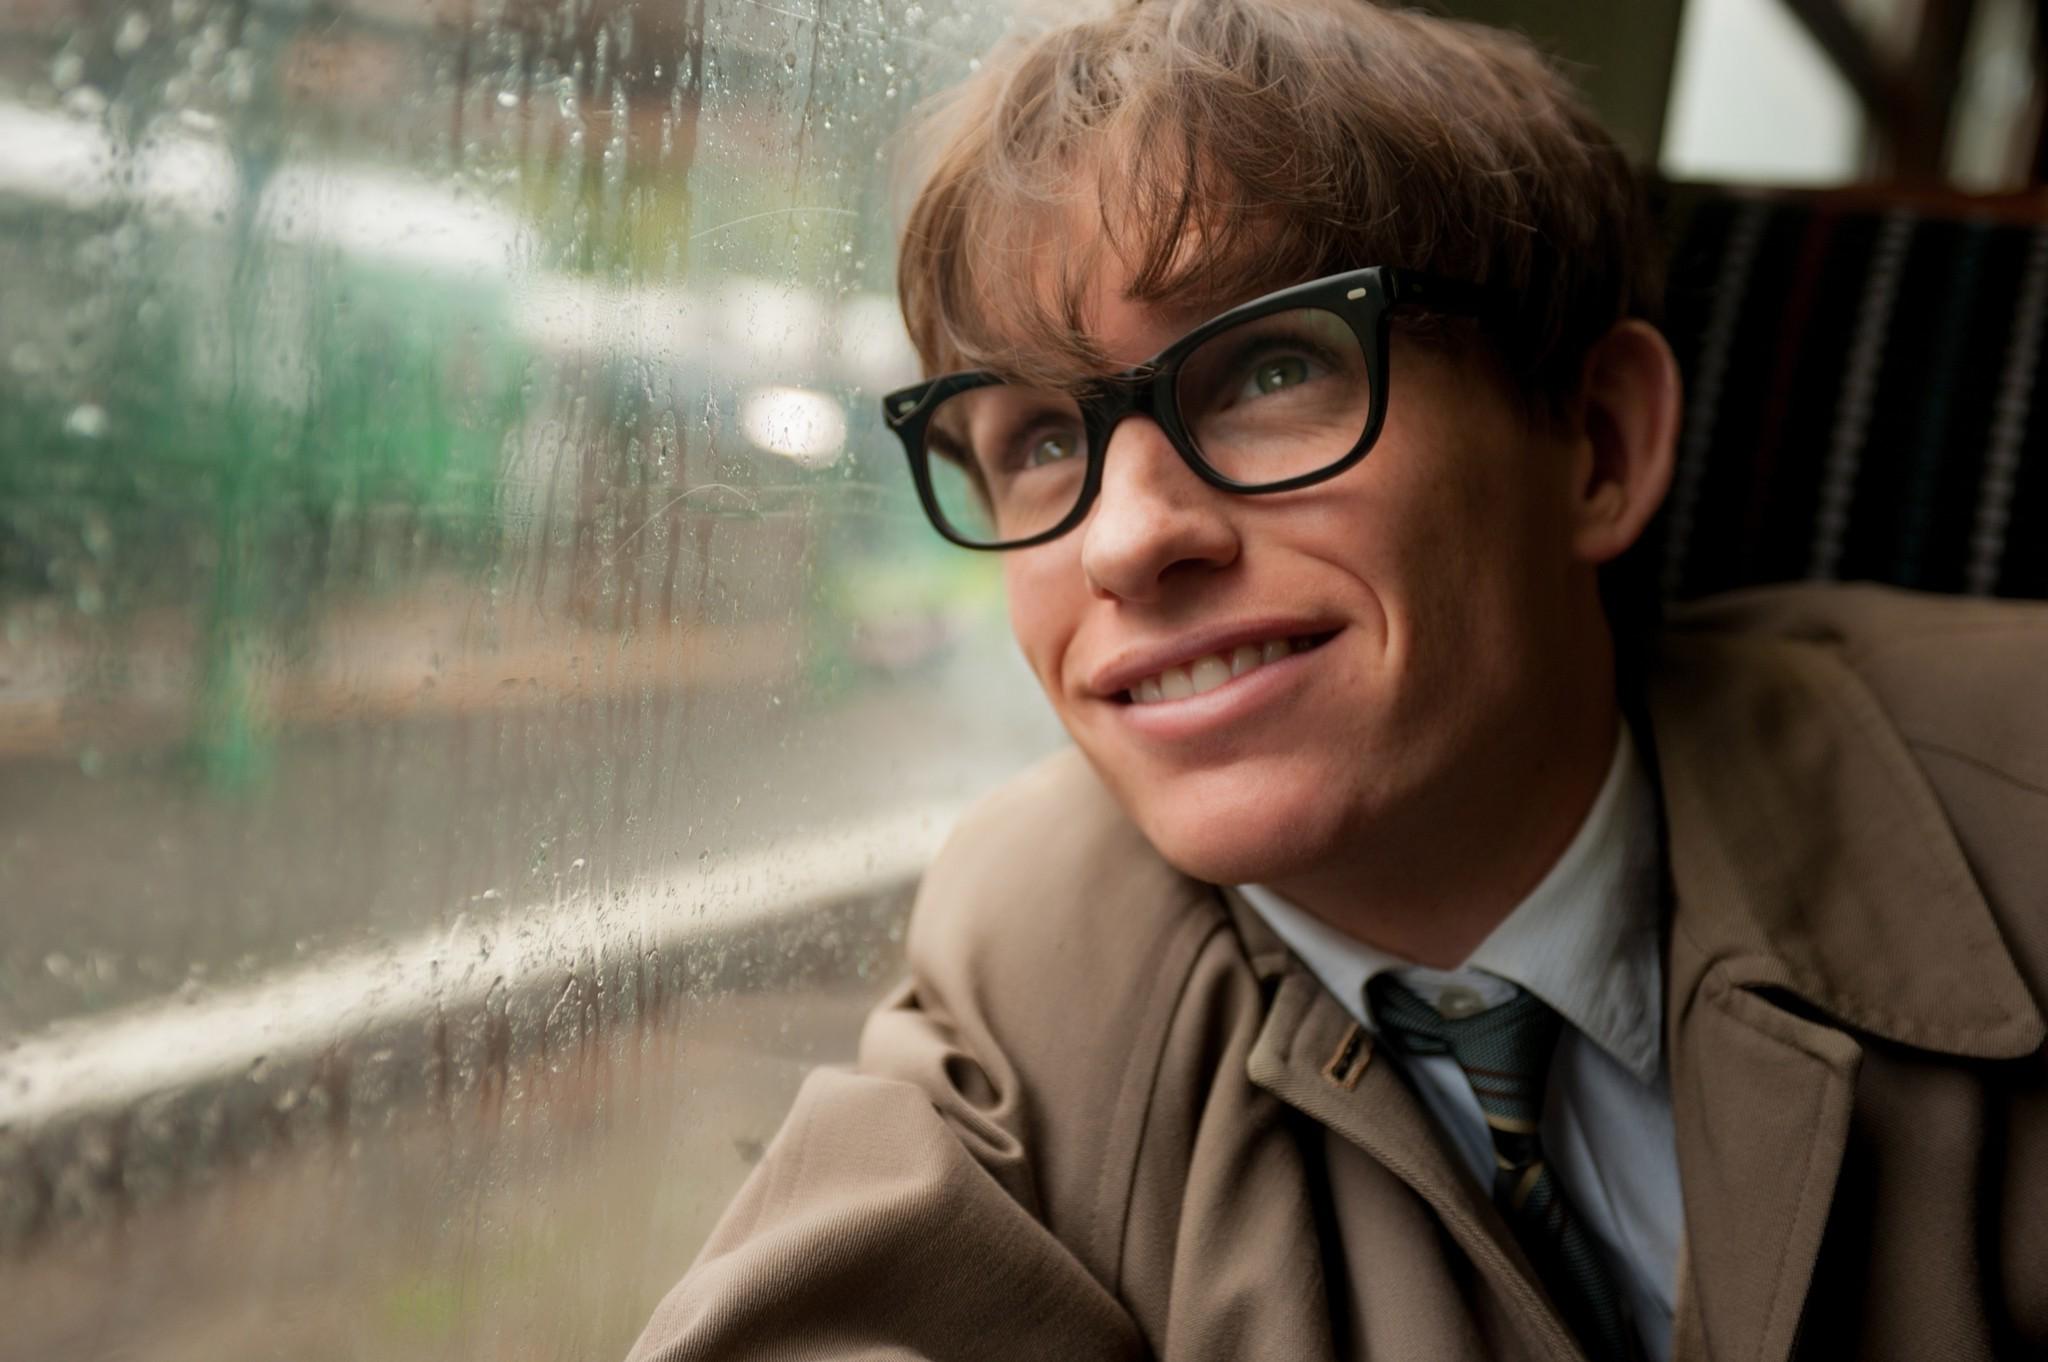 Oscar 2015 Winner Predictions: Actor